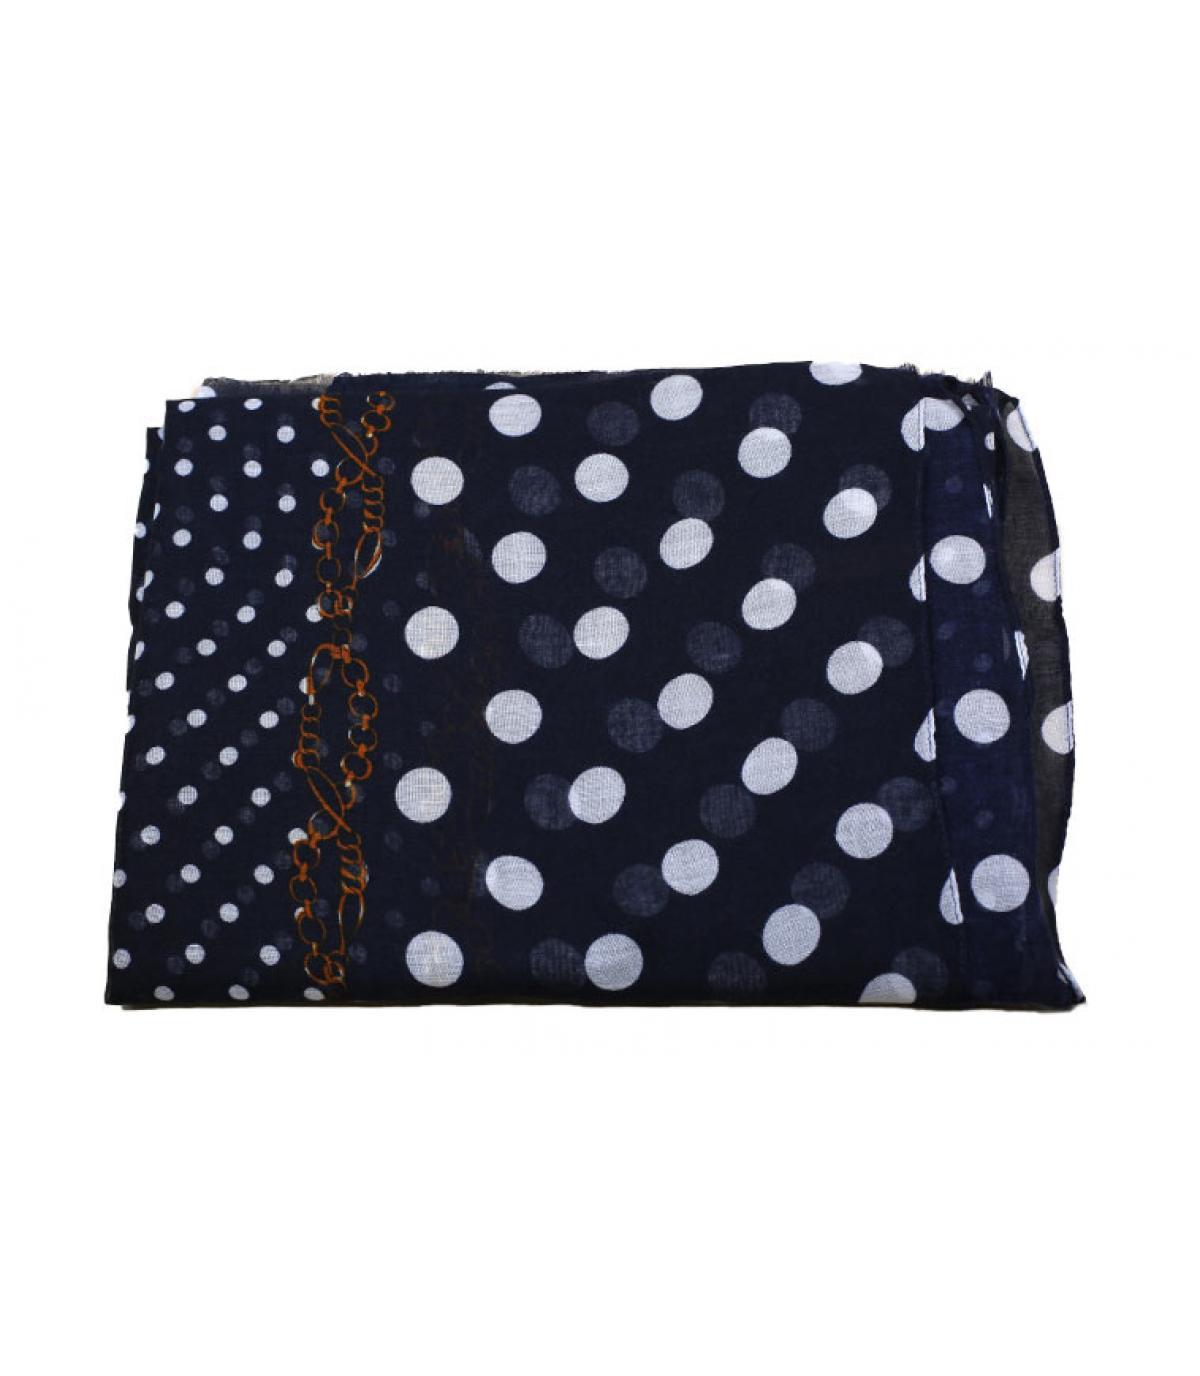 blauw witte polka dot sjaal